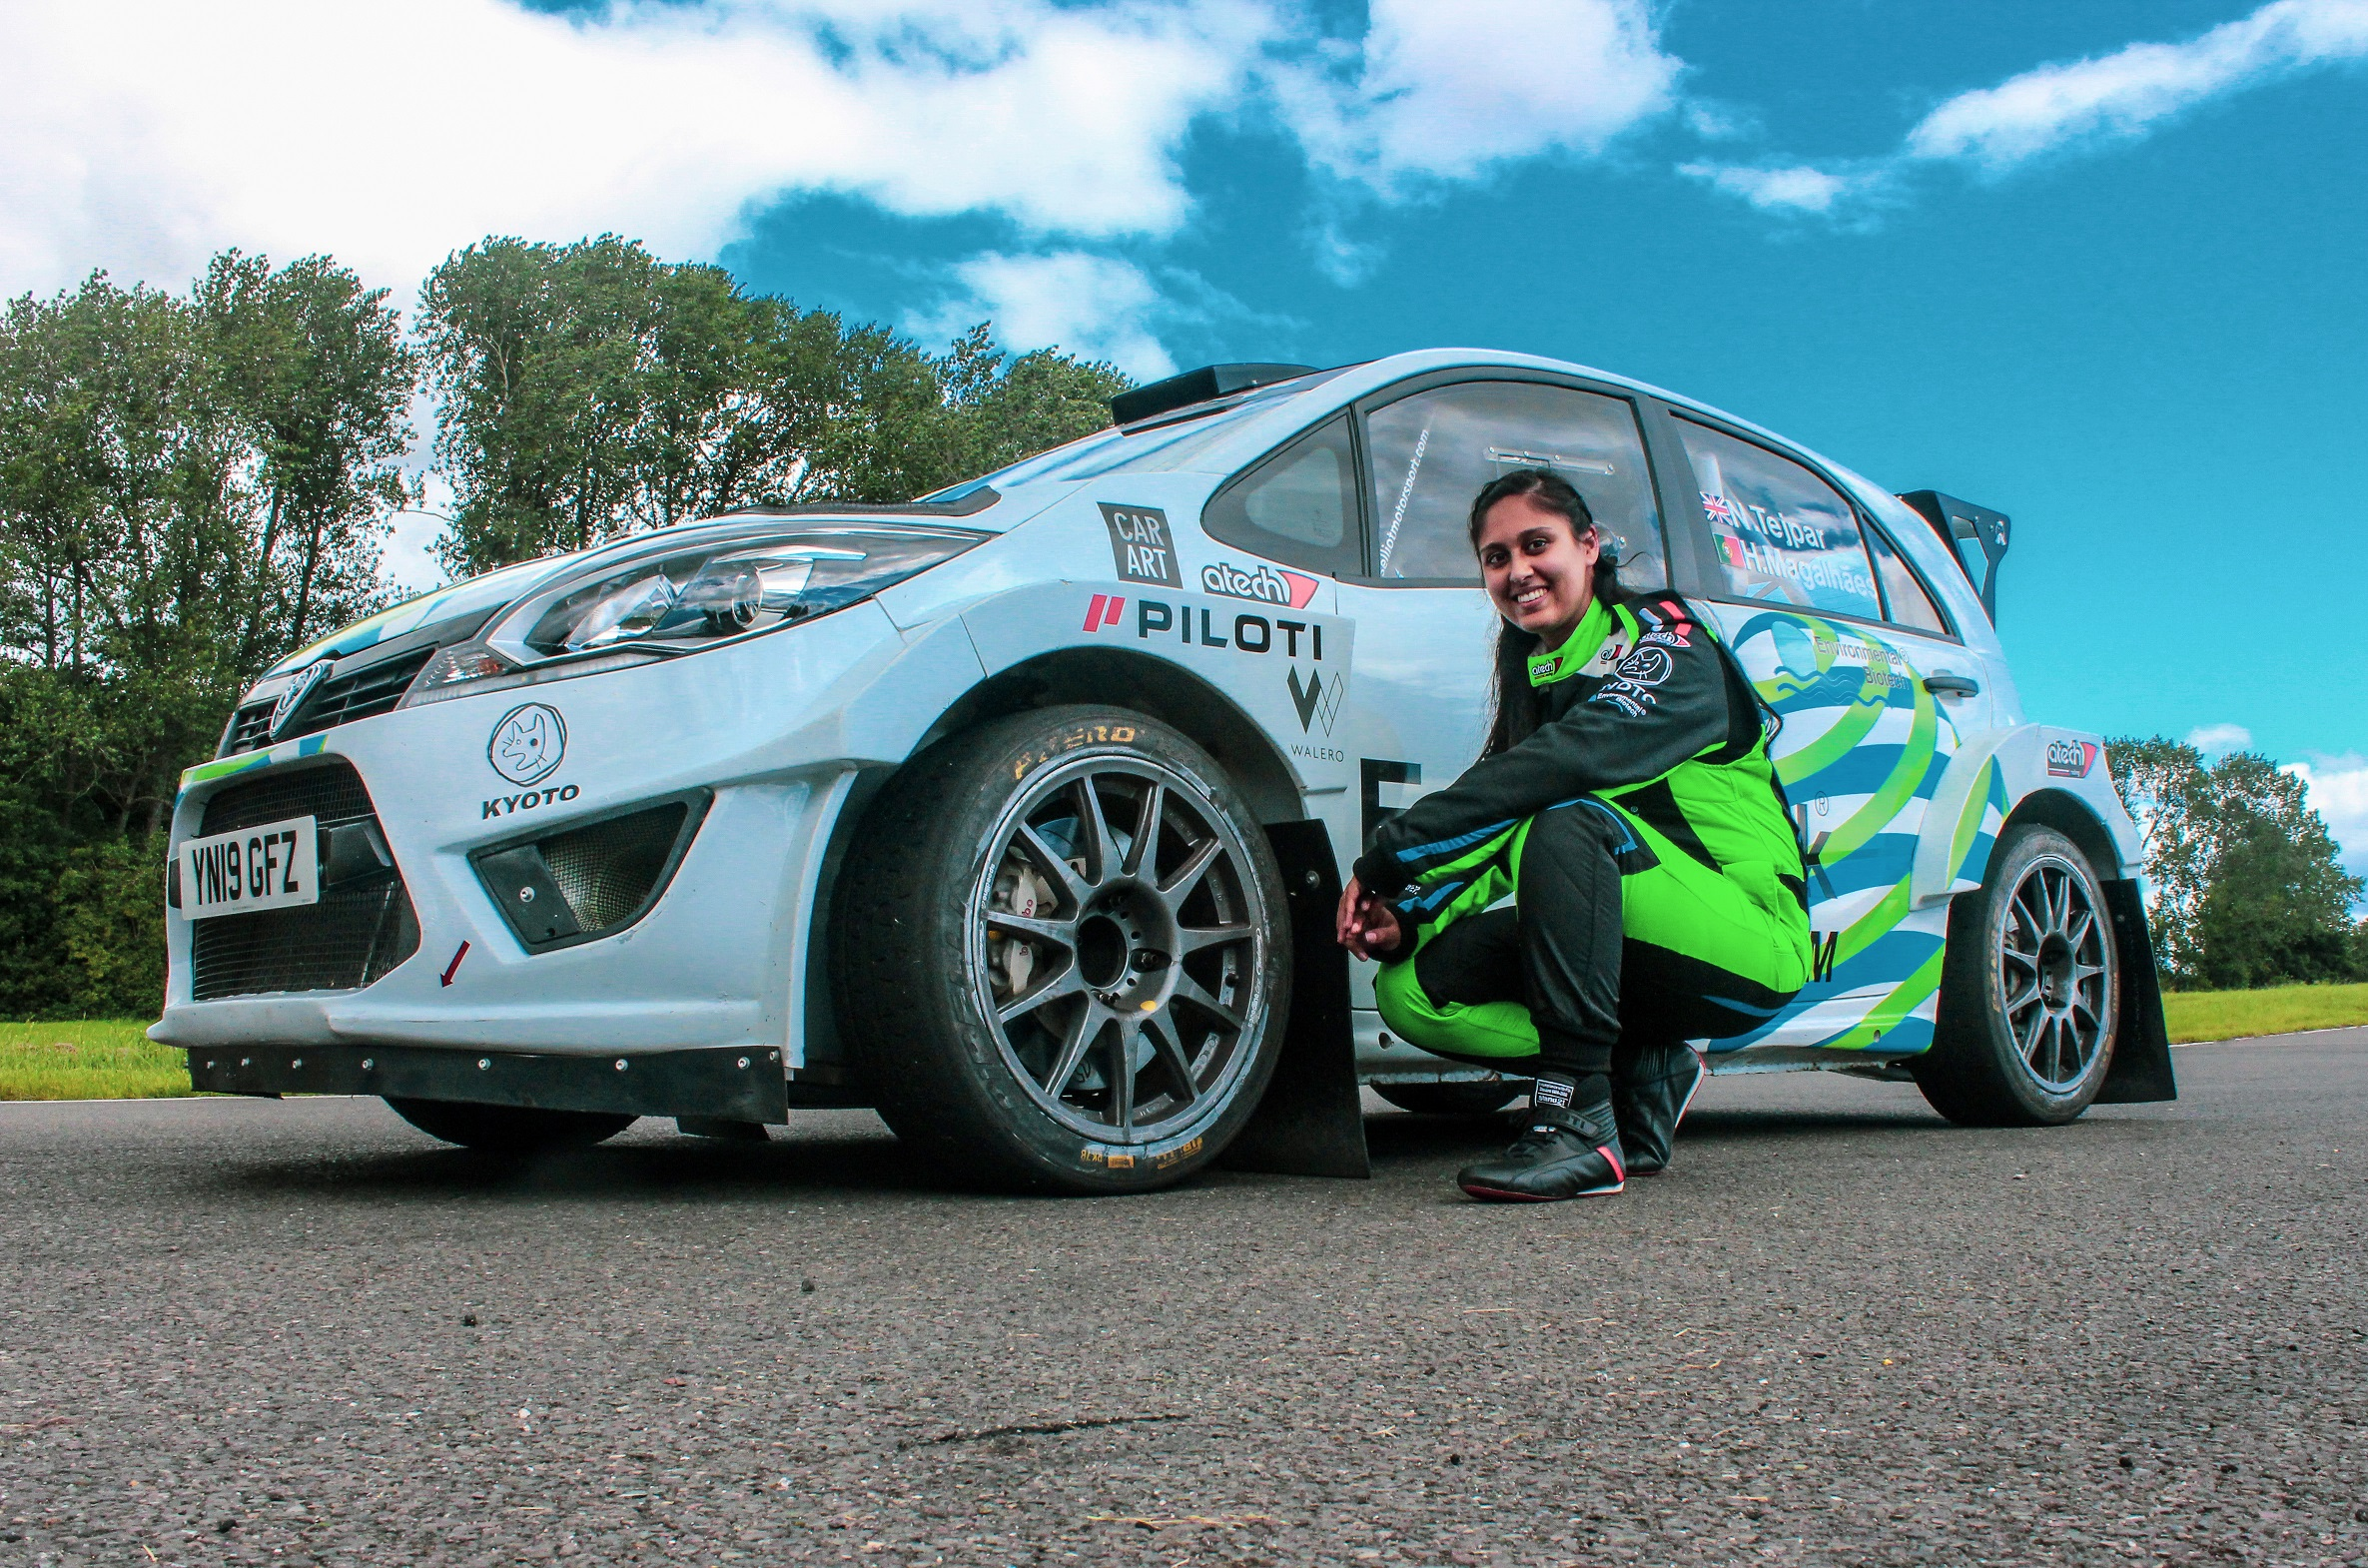 FIA European Rally Championship: Temporada 2021 - Página 6 6ffa8bef-b00b-914e-bed9-a8d8a493641d